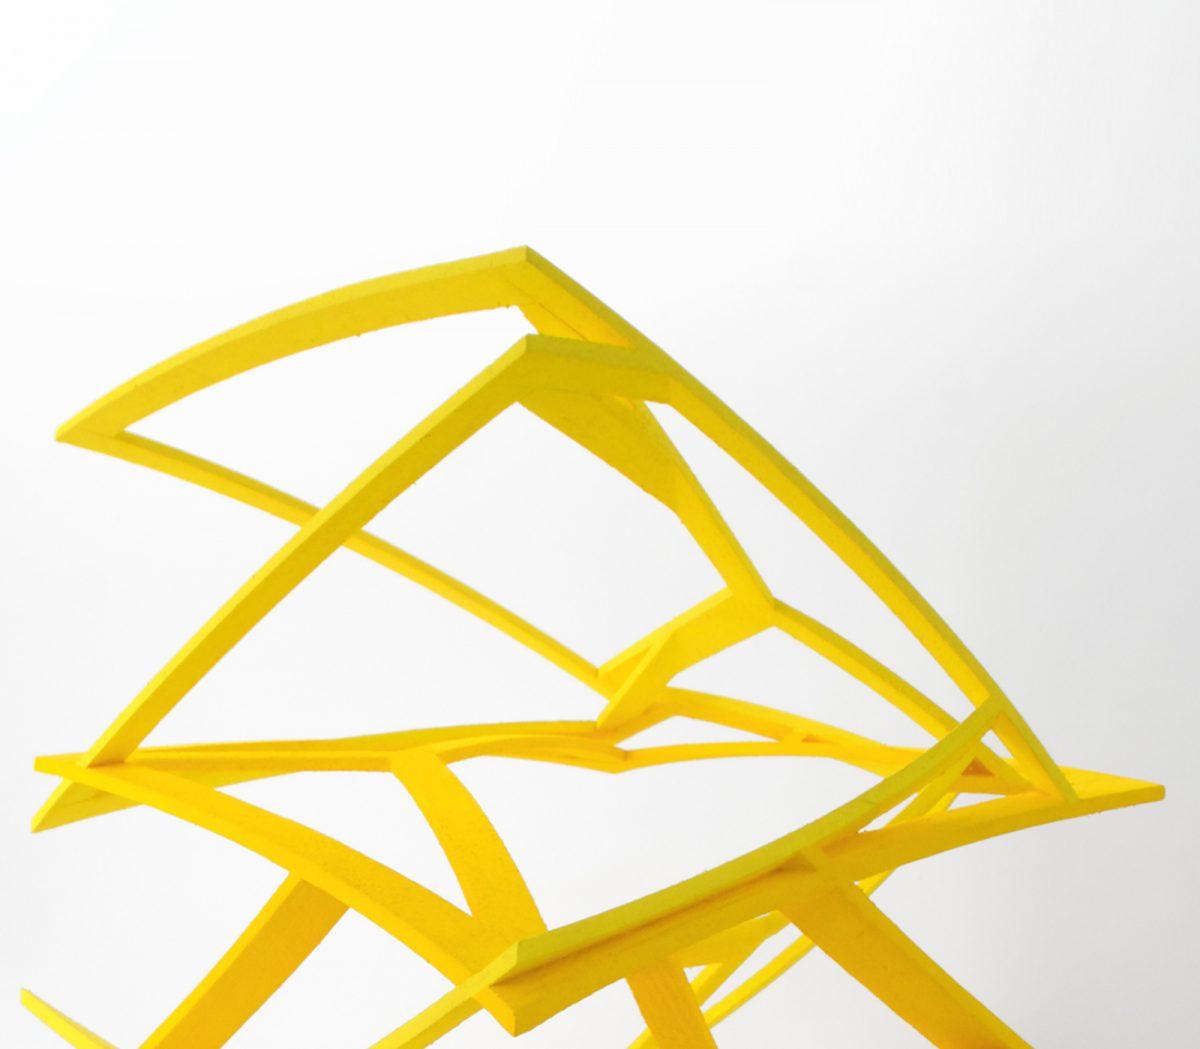 Atelier_Aescht_Cube_Formation_01_03_Installation_1600_1060